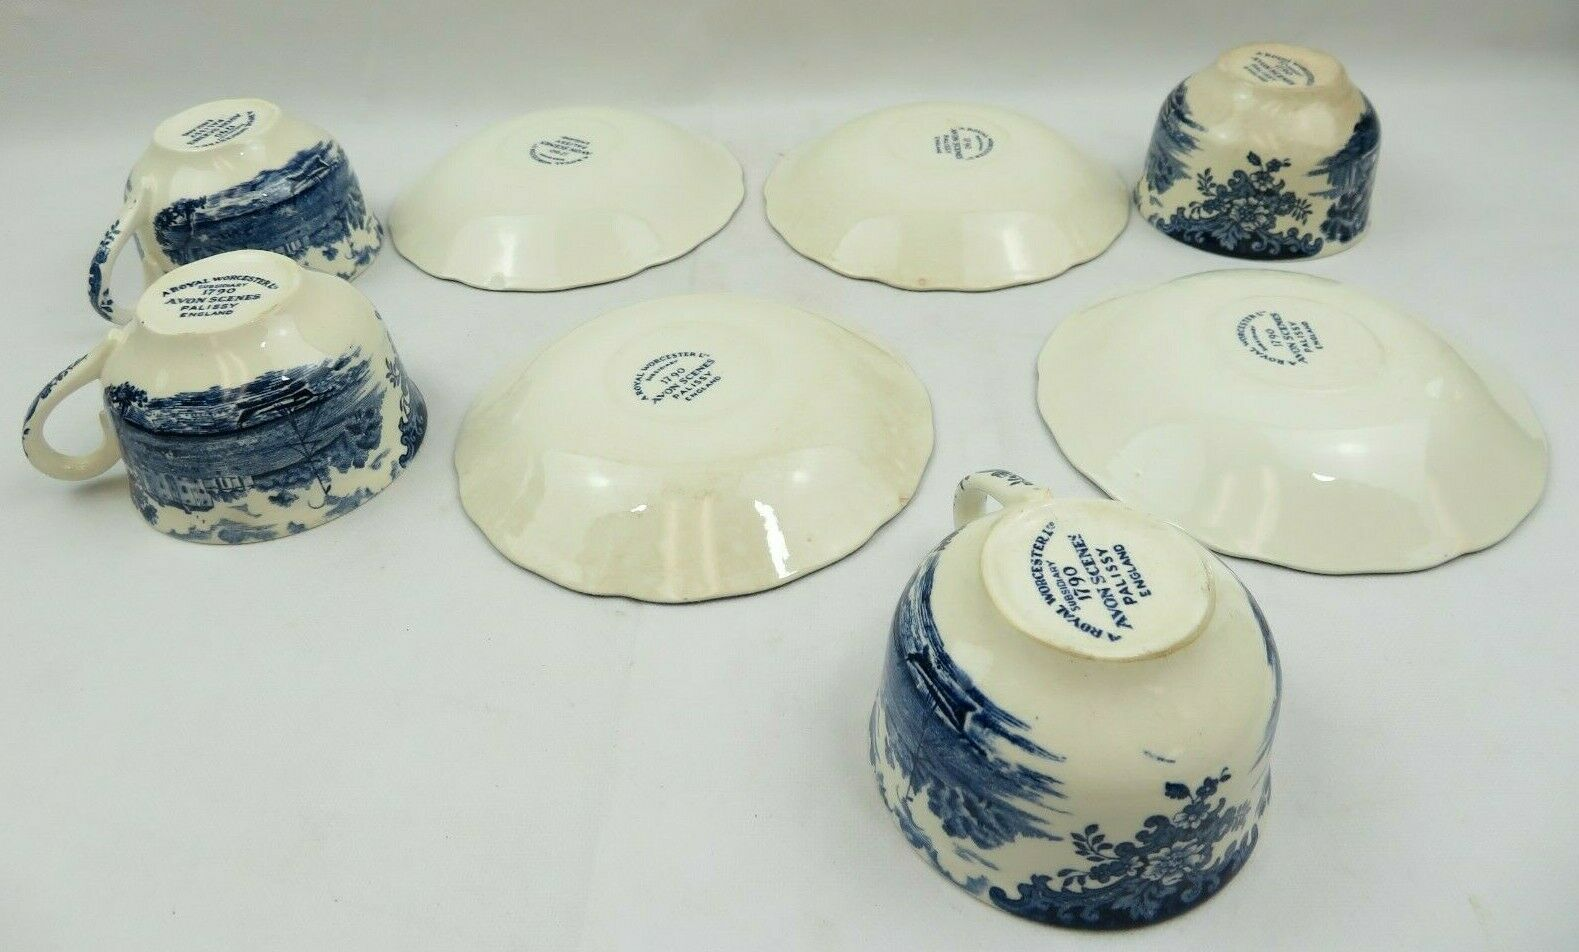 Vintage 4 Blue Royal Worcester Palissy Avon Scenes England 1790 Cups & Saucers